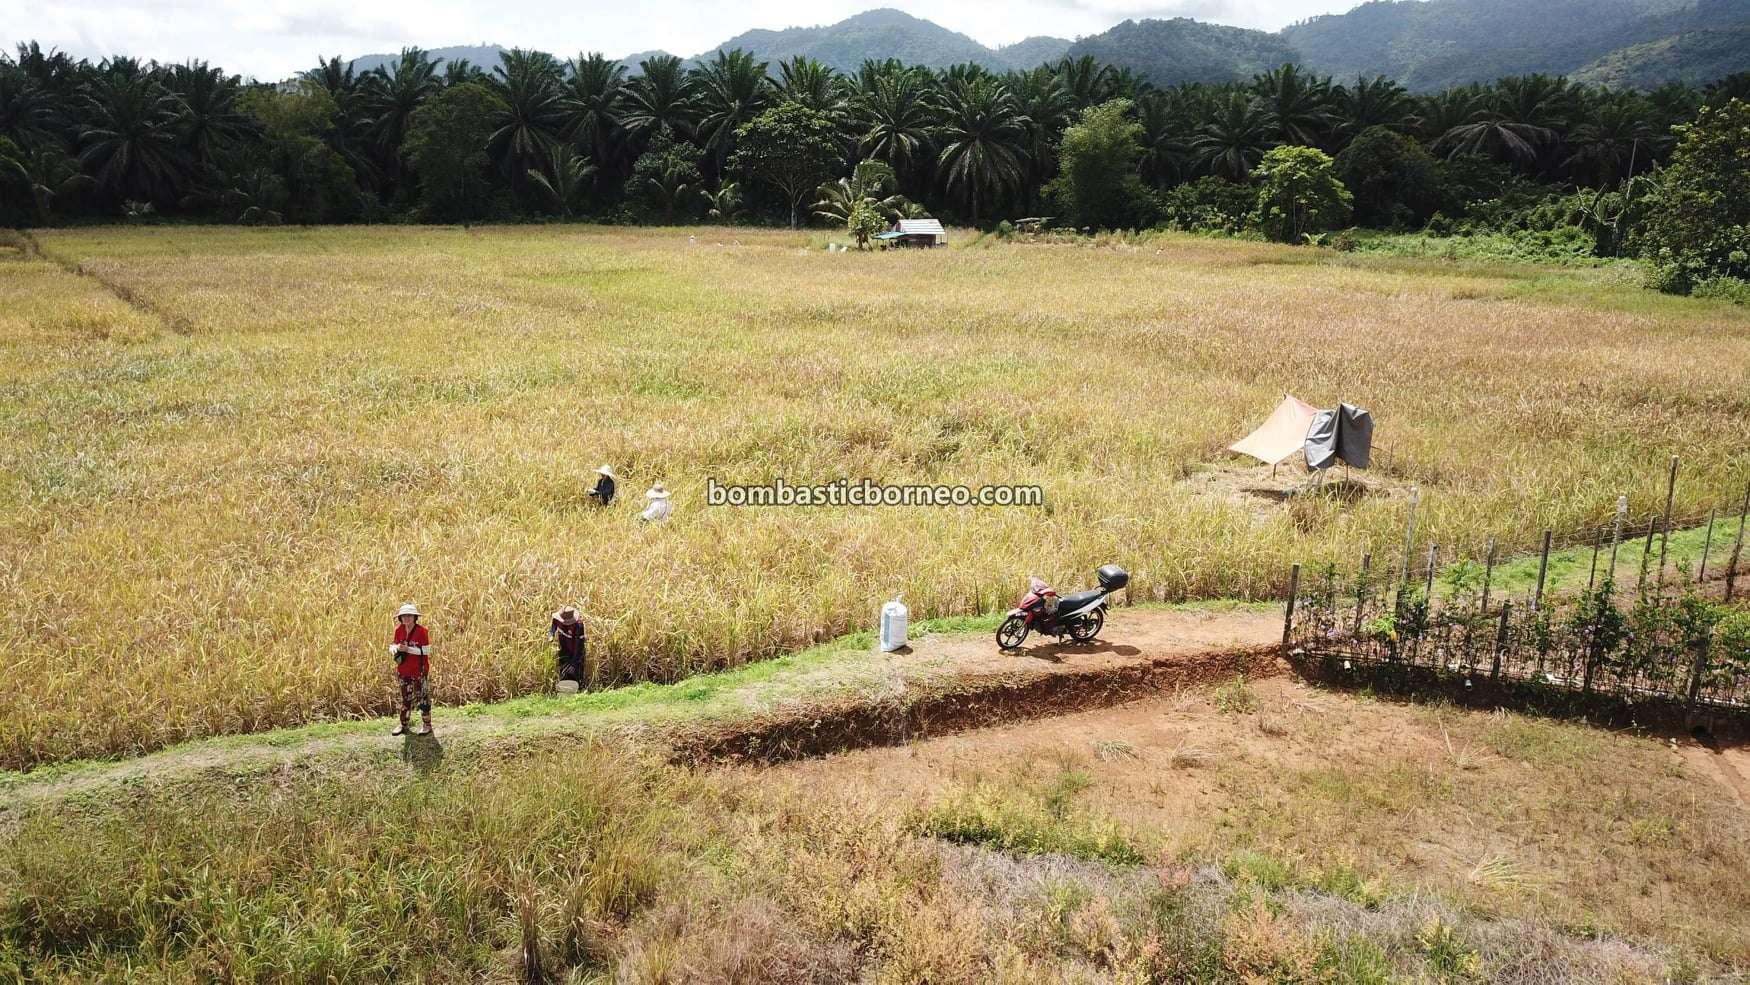 Village, Paddy field, Sawah Padi, Dayak Bidayuh, traditional, destination, Serian, Malaysia, Tourism, tourist attraction, travel local, Borneo, 穿越婆罗洲游踪, 马来西亚砂拉越, 西连稻米之乡